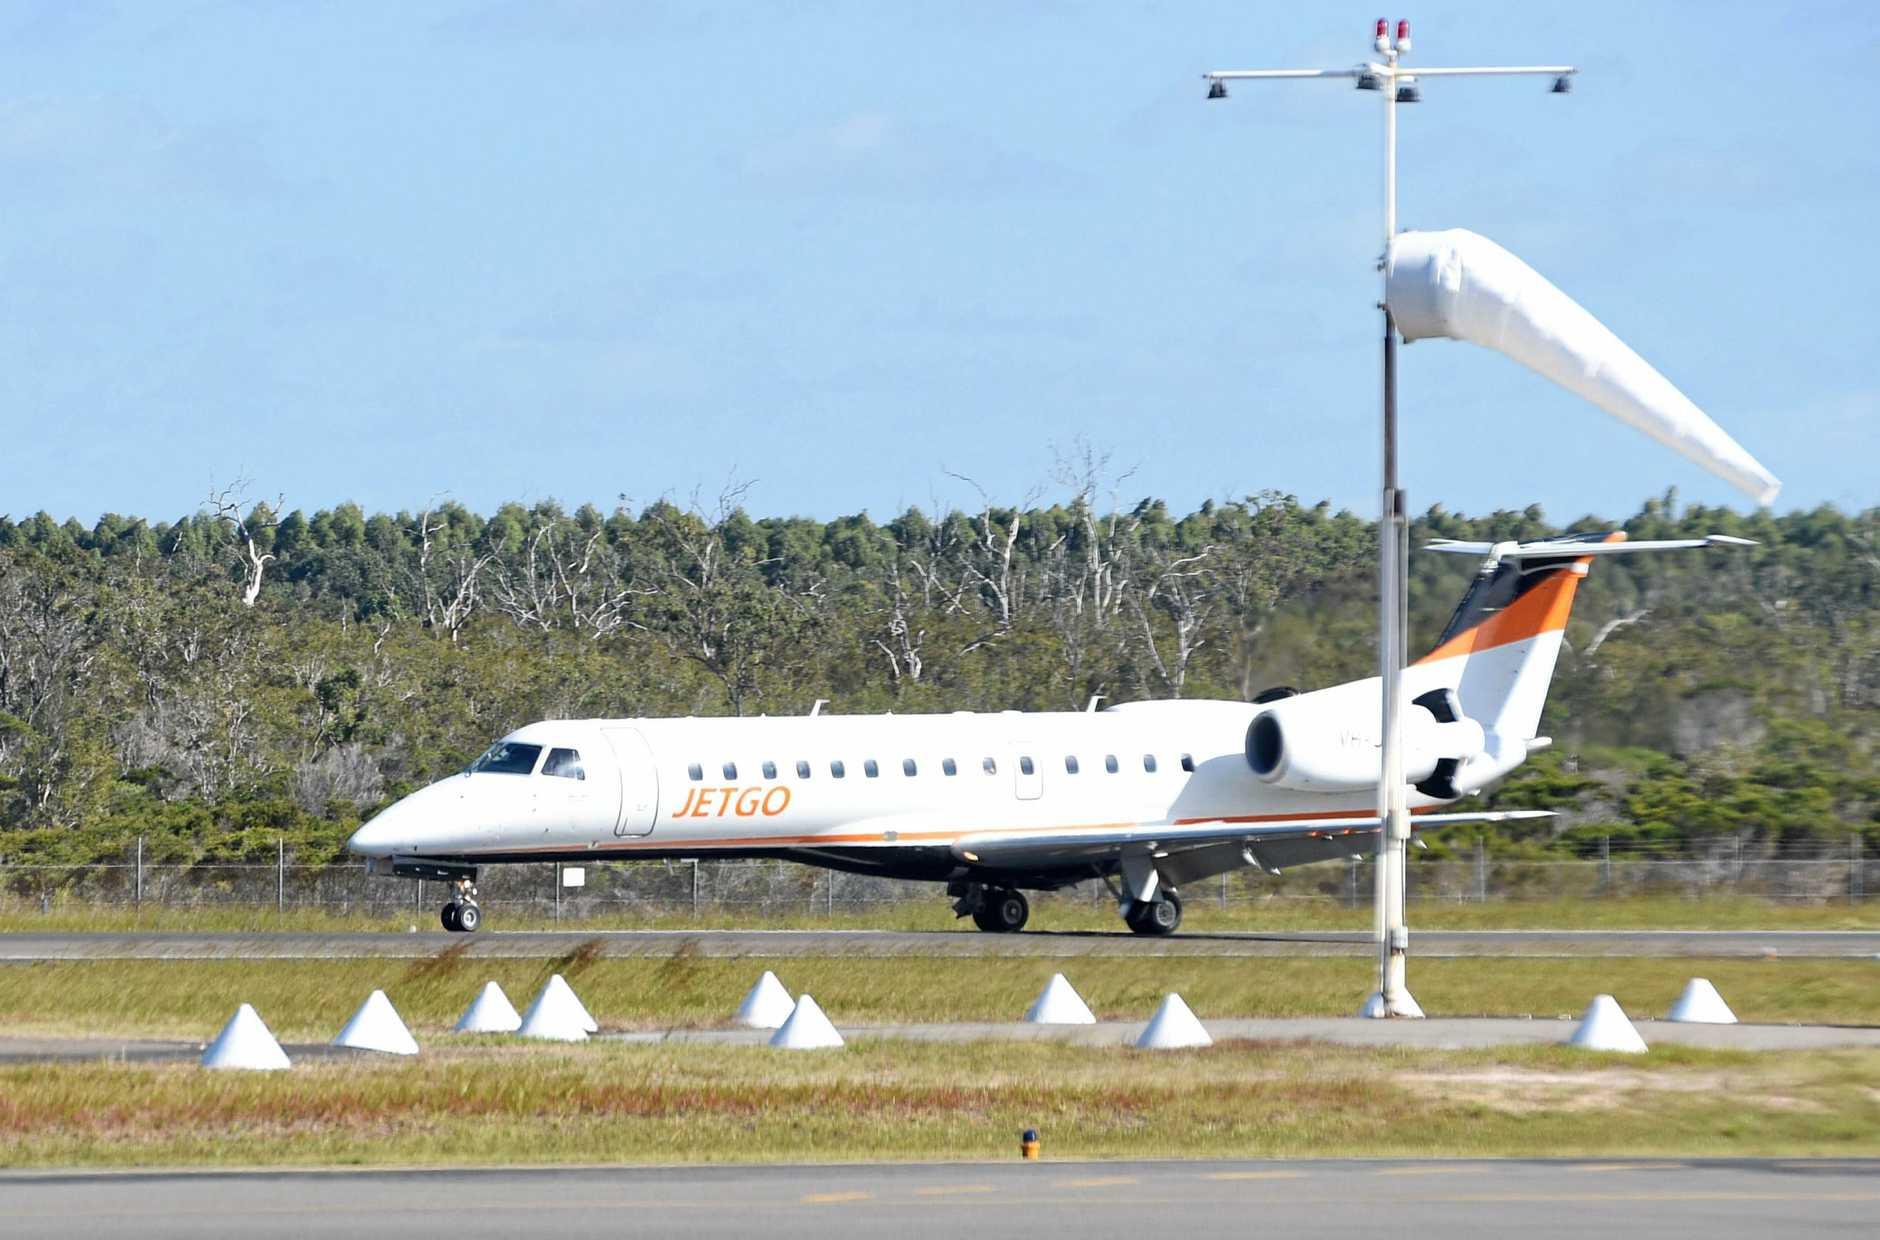 The first Jetgo plane arrives in Hervey Bay.